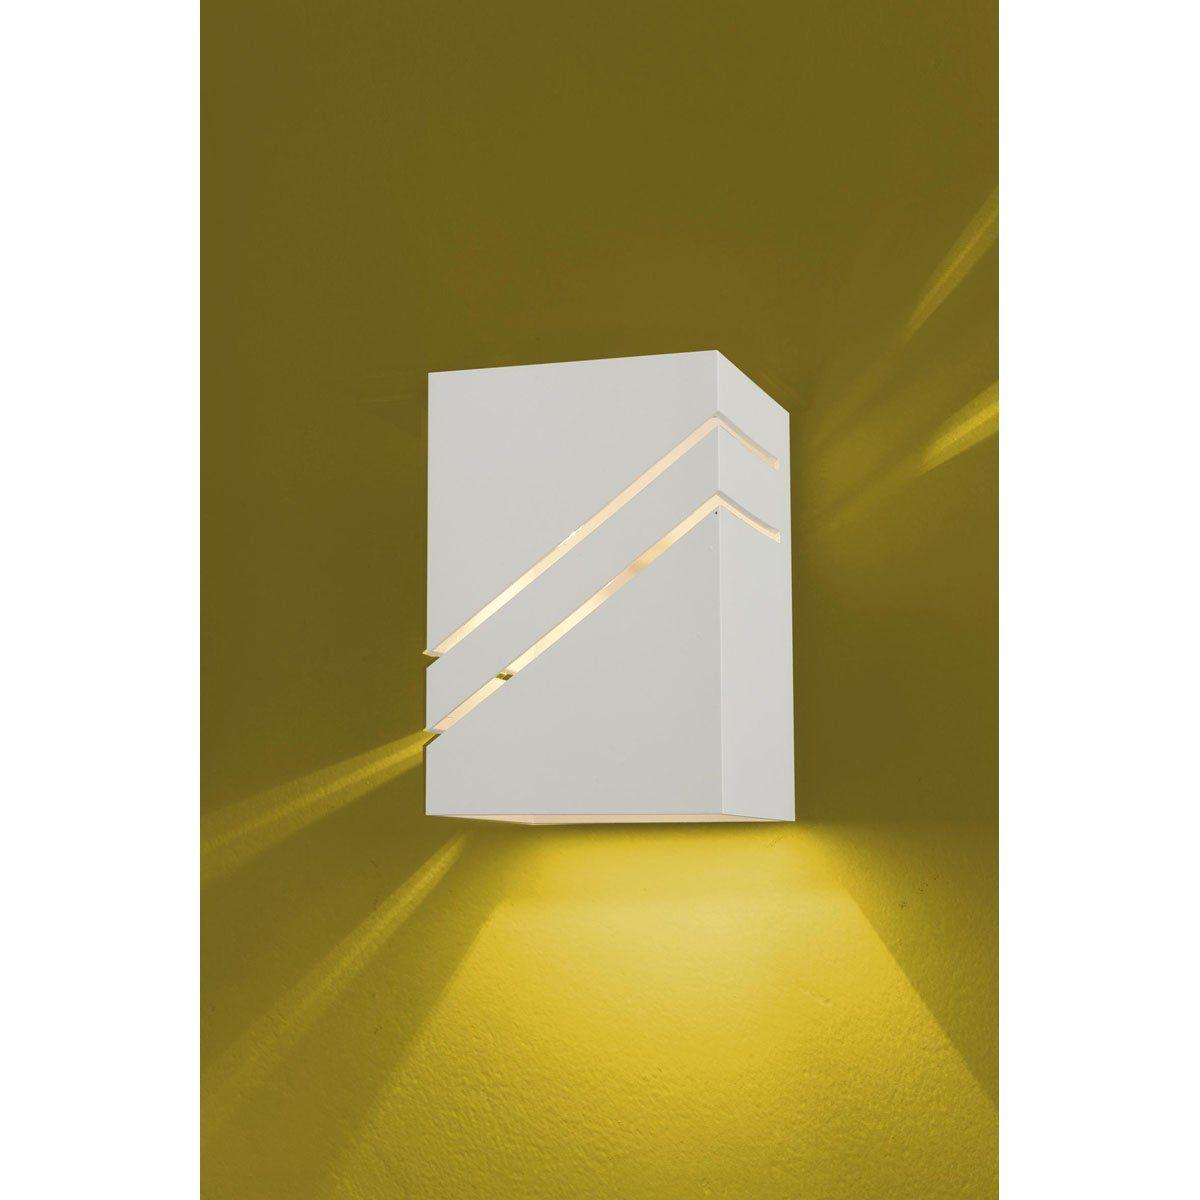 Arandela Flash tubo quadrada 02L Diagonal 01 GU9 Tampa Alumínio - Branca Microtexturizada